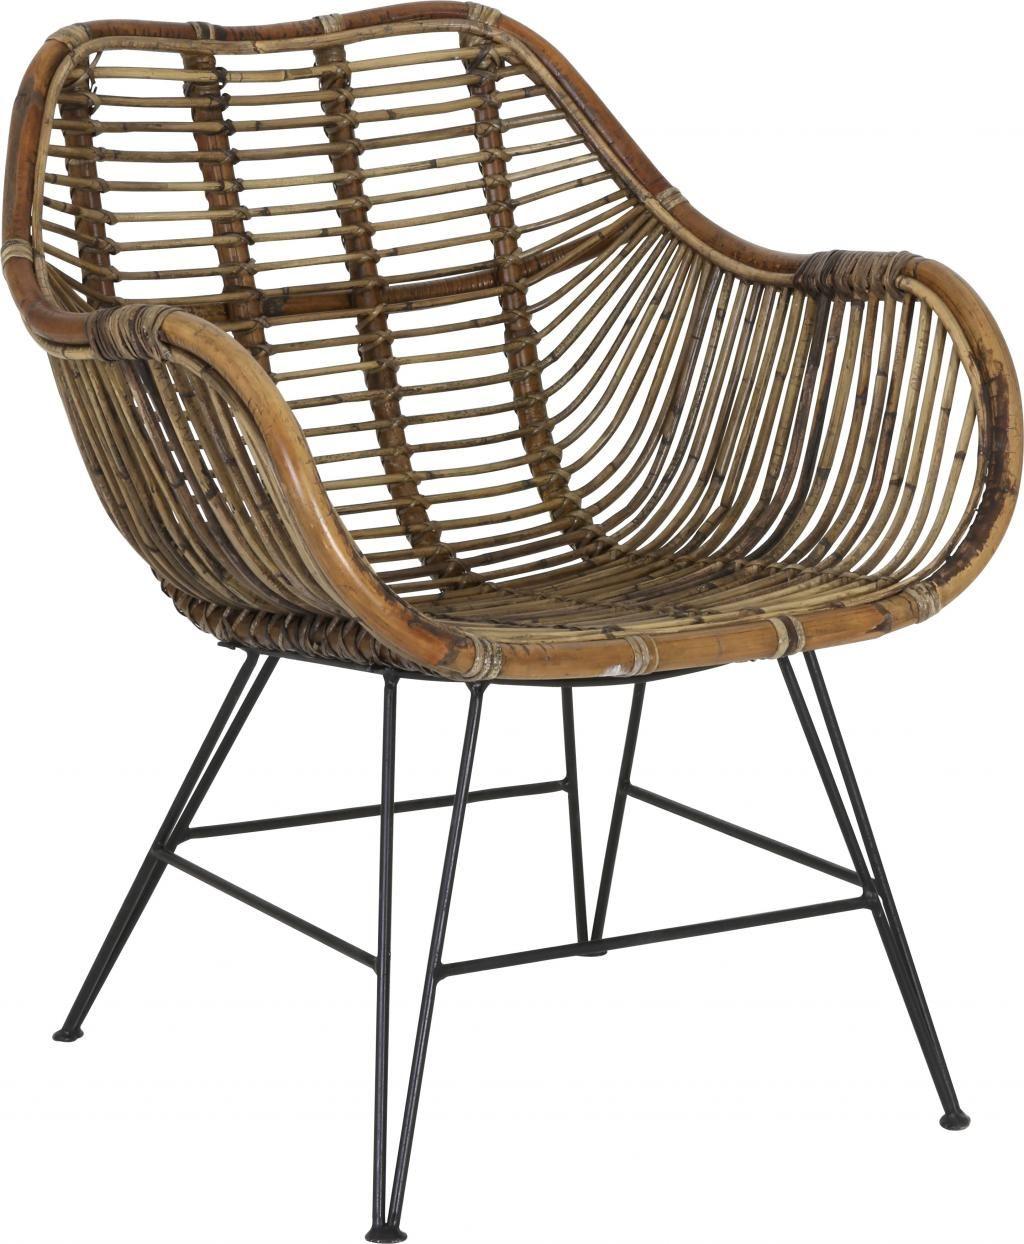 Stoel malang rotan bruin light living rotan for Rotan eettafel stoel